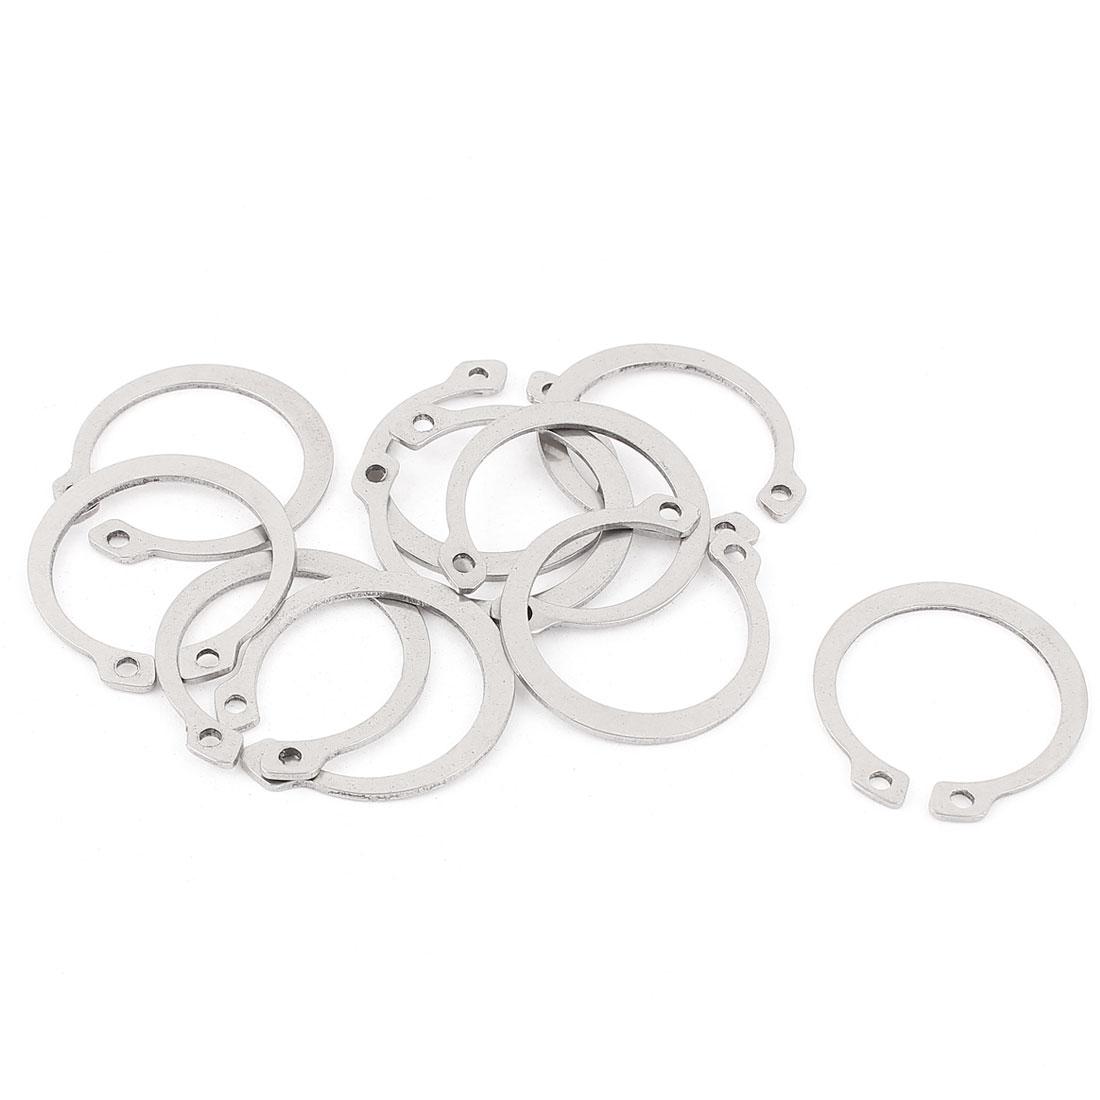 10pcs 304 Stainless Steel External Circlip Retaining Shaft Snap Rings 26mm